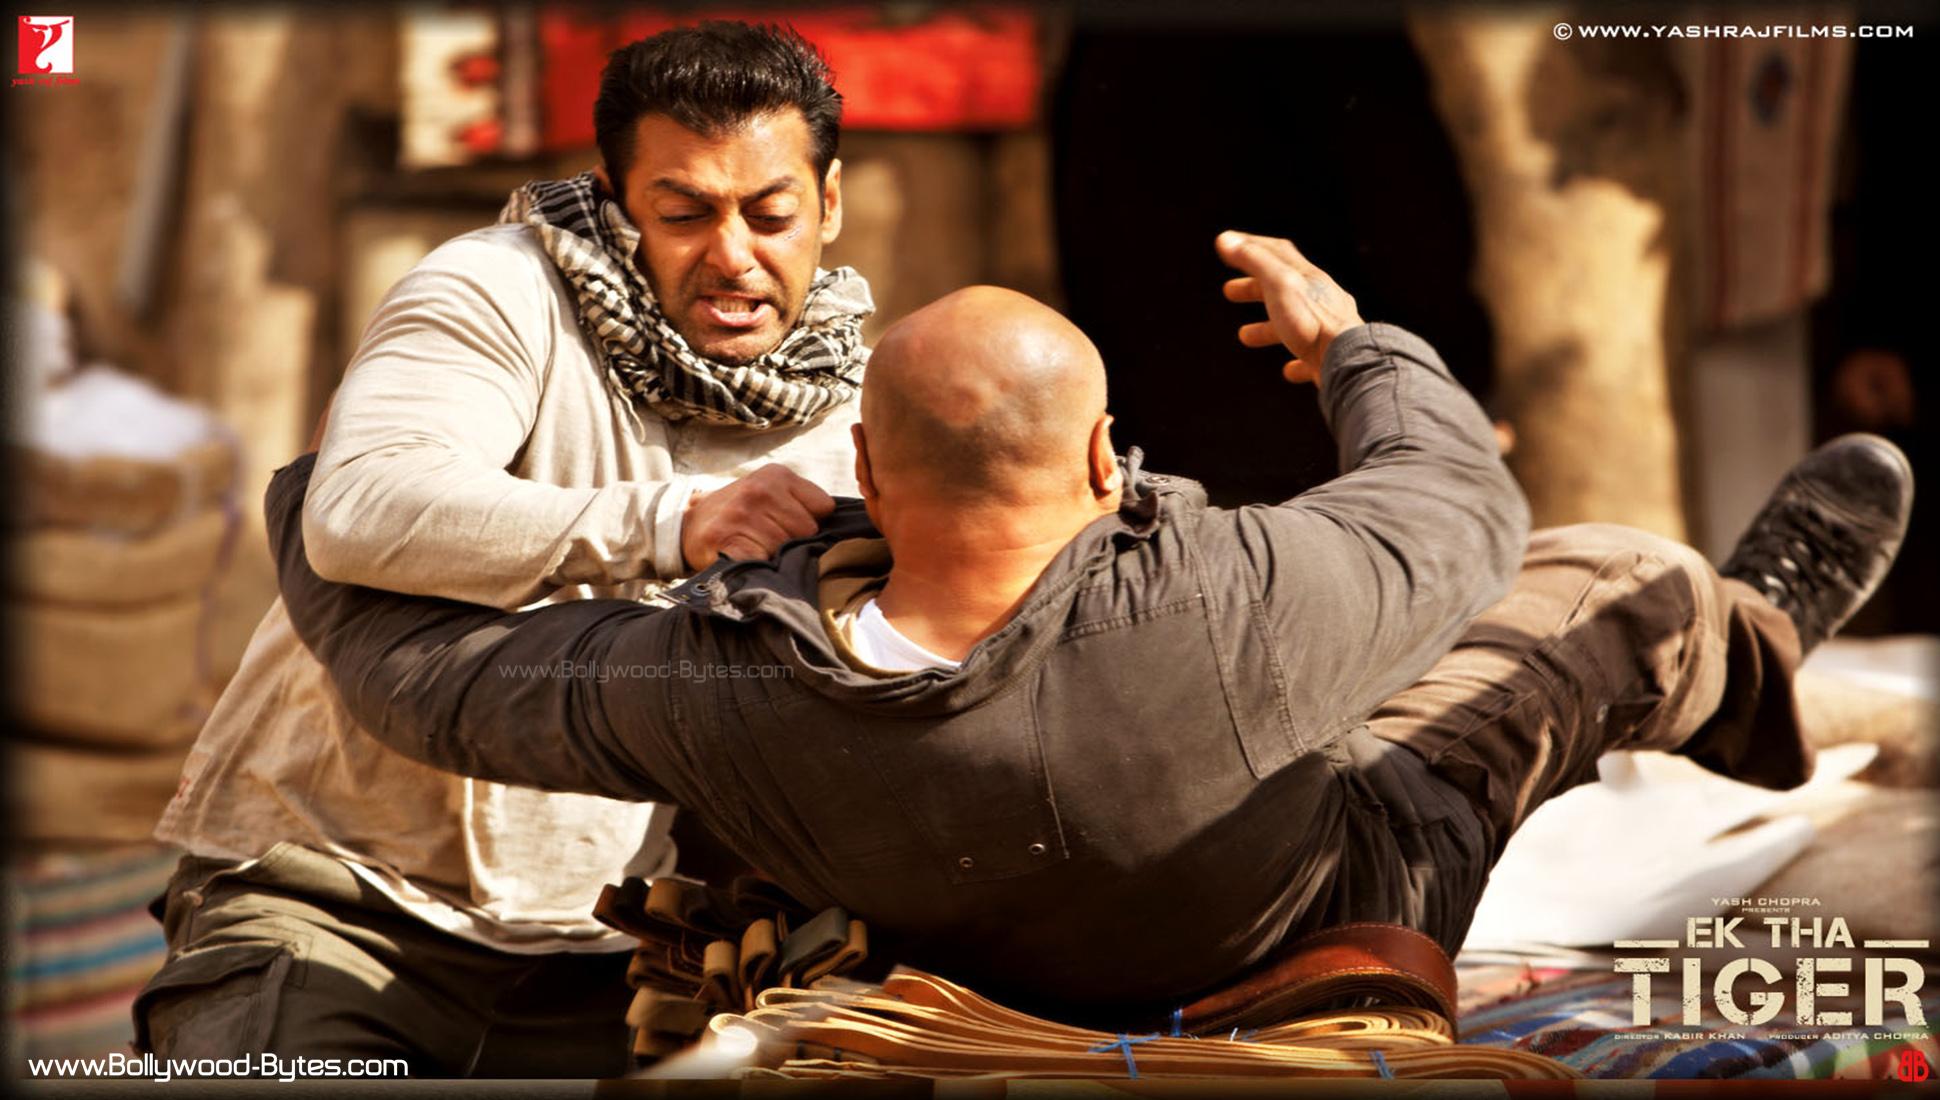 http://2.bp.blogspot.com/-kXGhnpNn2vg/UAhXsuNPGpI/AAAAAAAAL48/VJl4eWLXsBc/s1940/Ek-Tha-Tiger-Salman-Khan-HD-Wallpaper-11.jpg